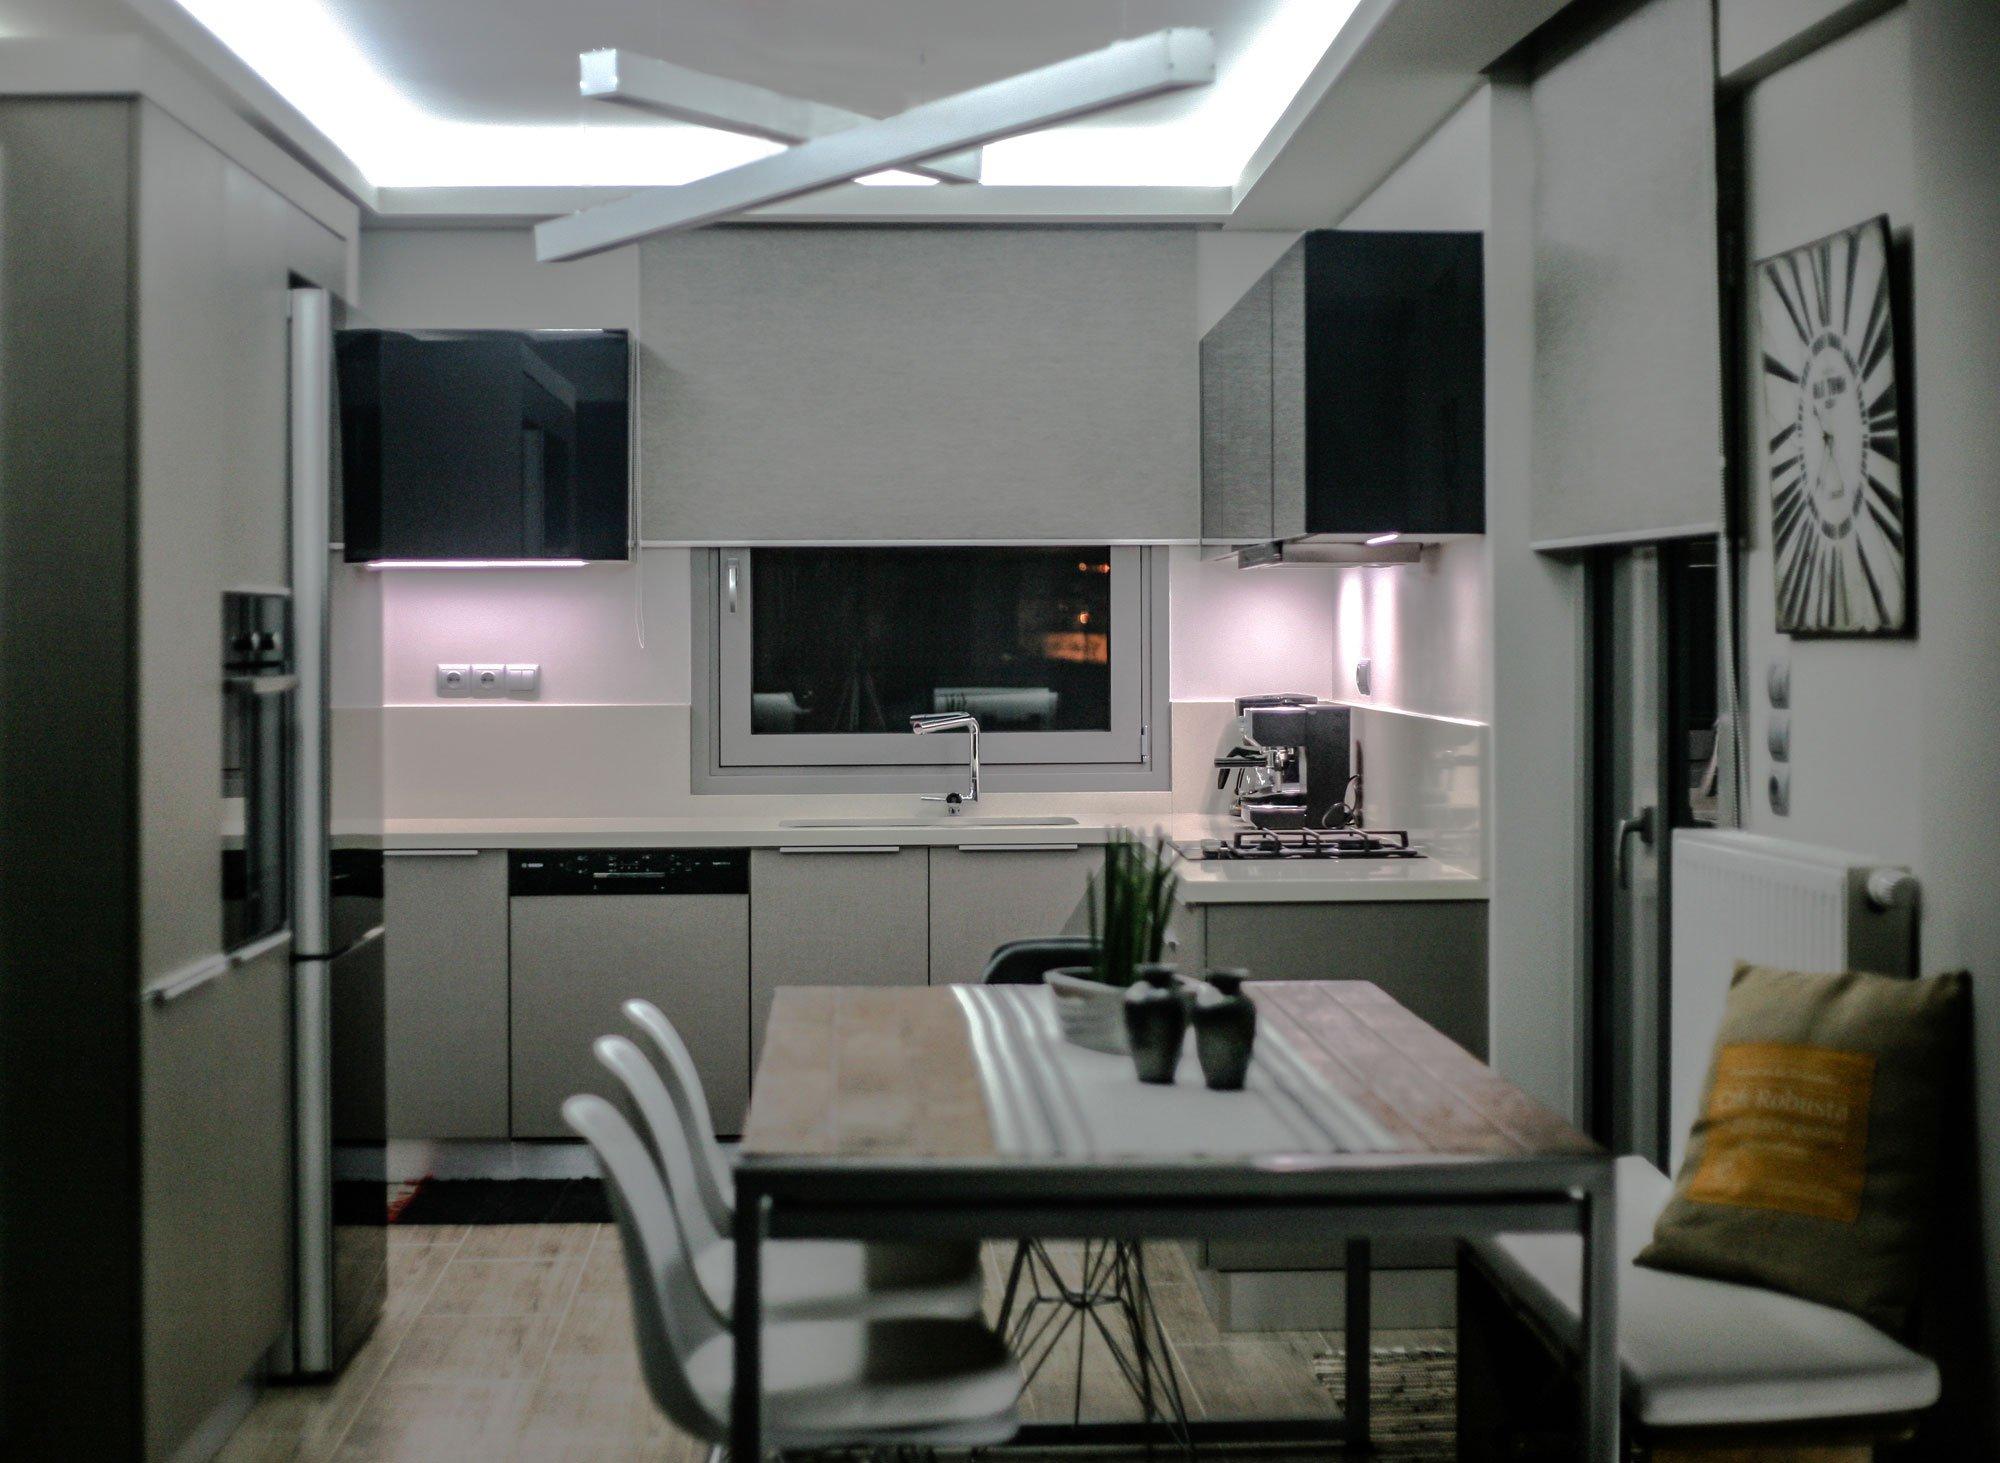 A-Stylish-Apartment-in-Heraklion-11